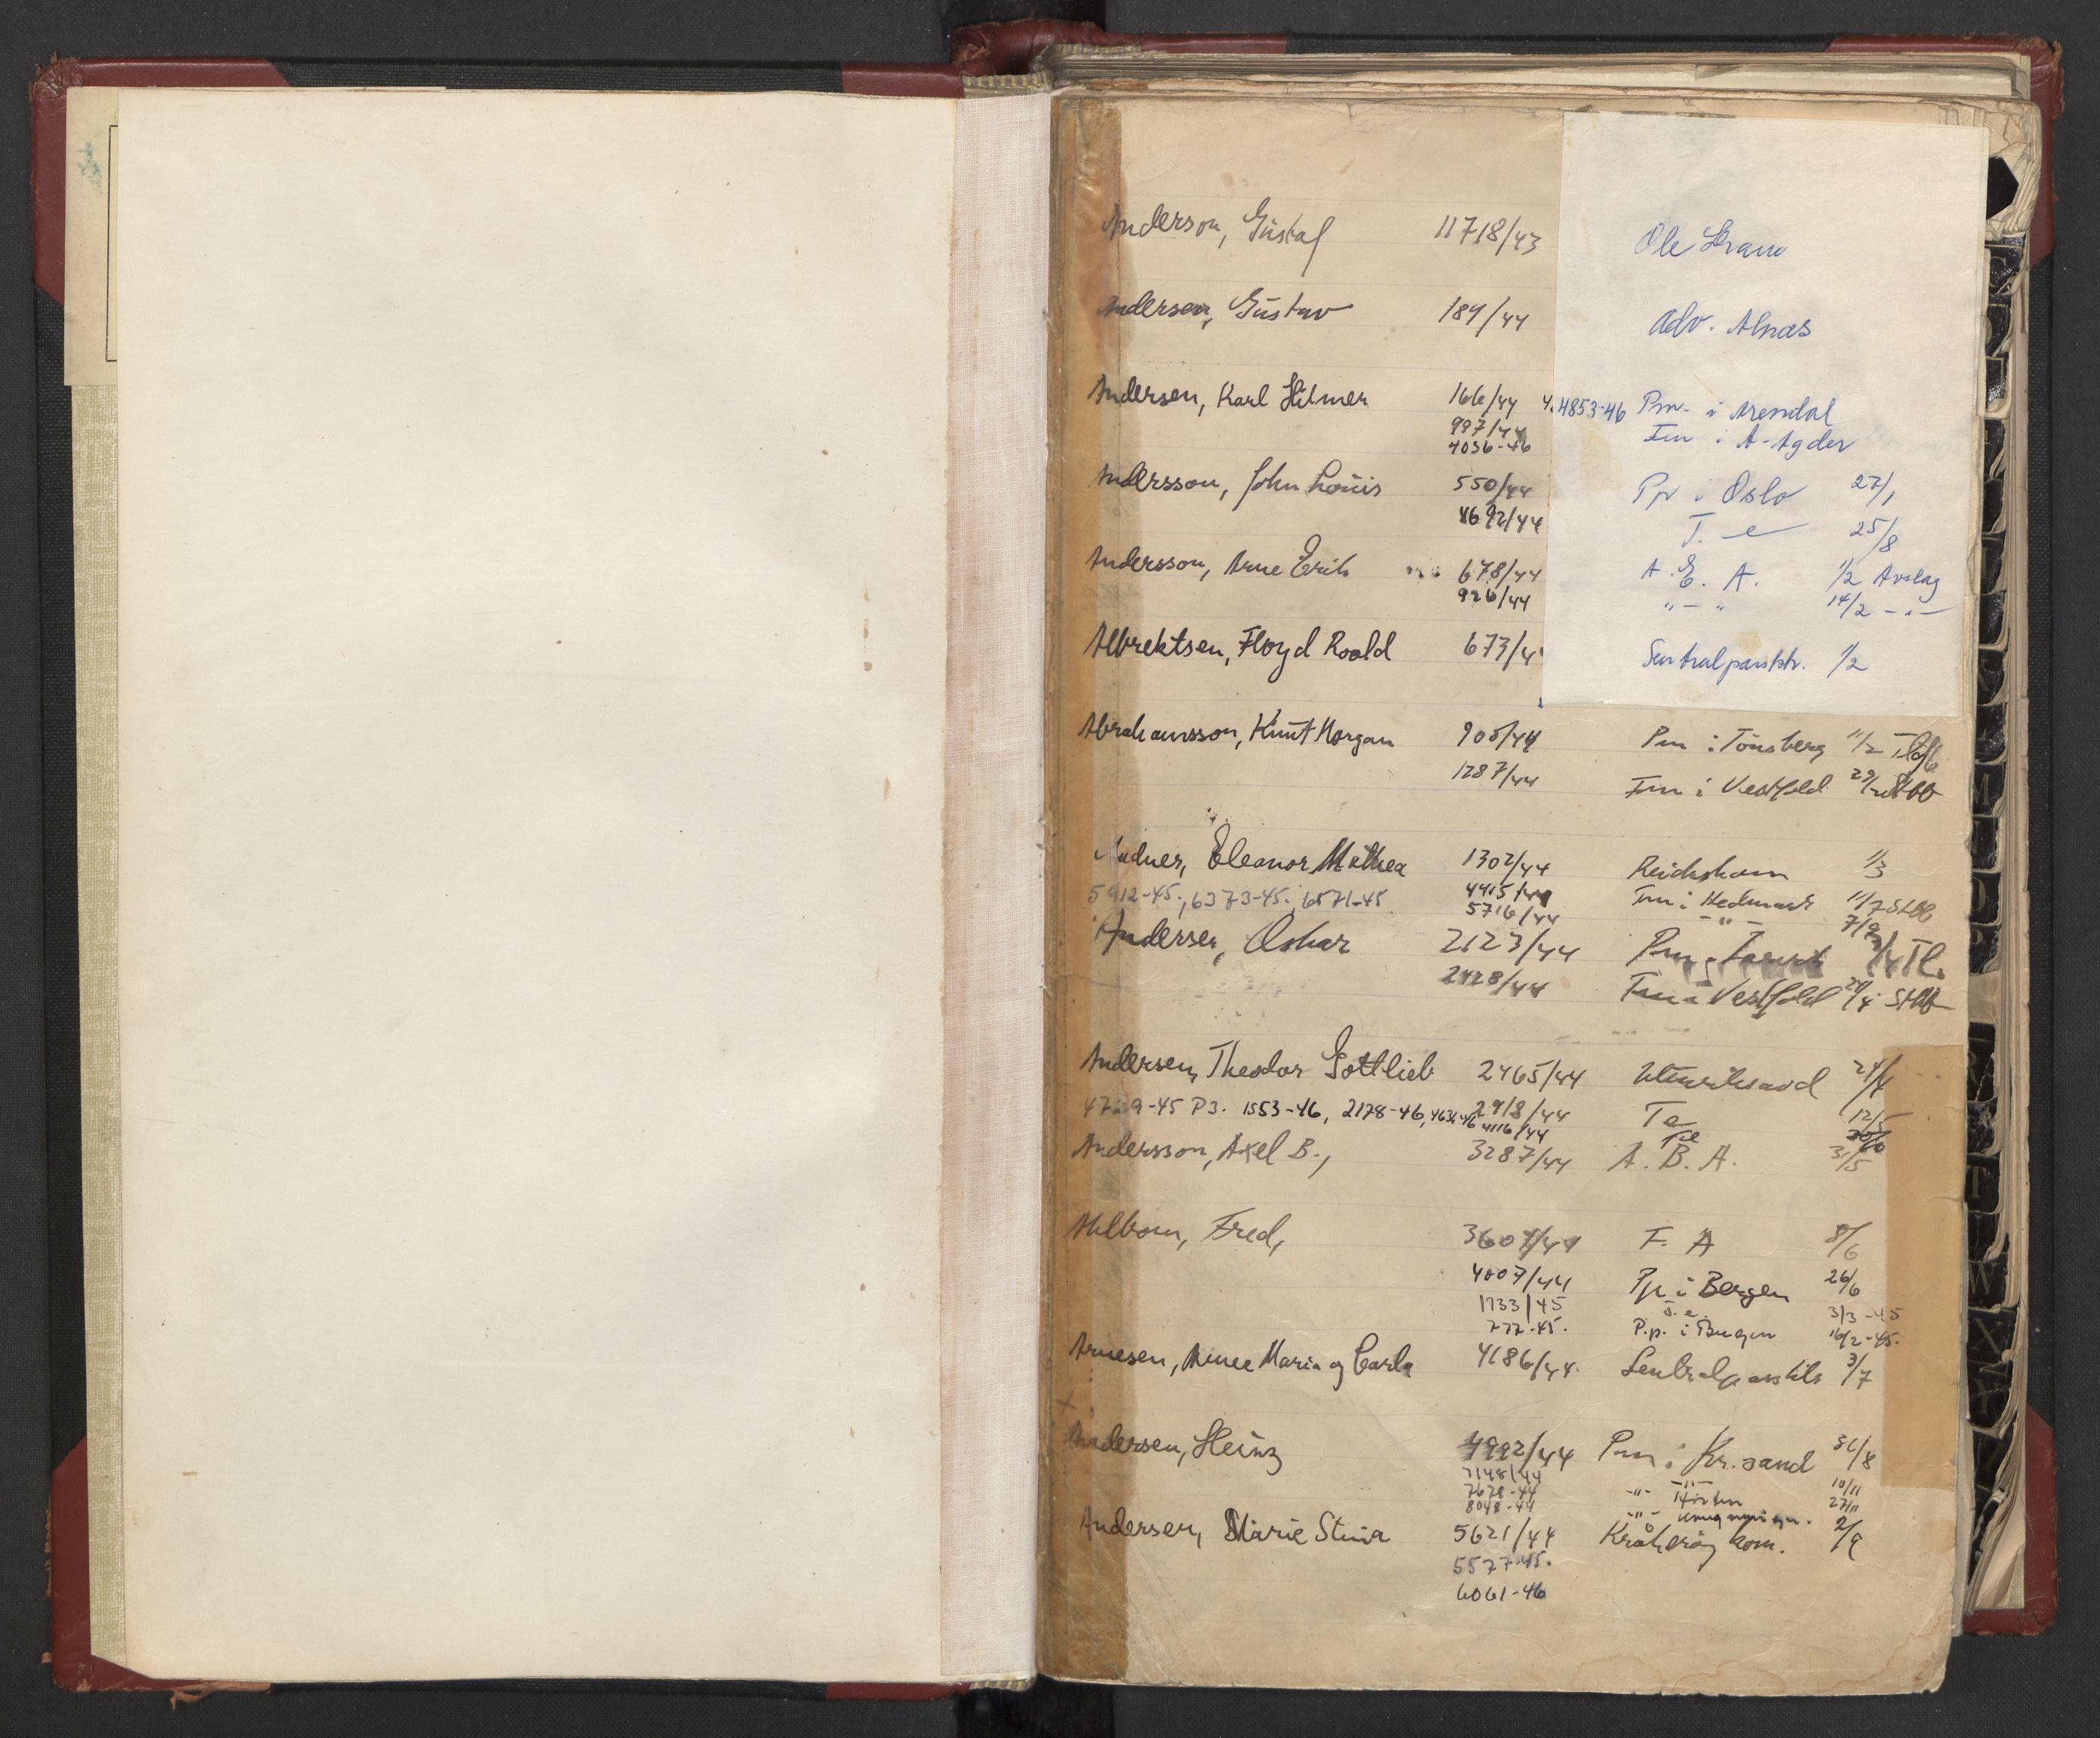 RA, Justisdepartementet, 3. politikontor P3, C/Cc/L0002: Journalregister over statsborgersaker, 1940-1946, p. 4